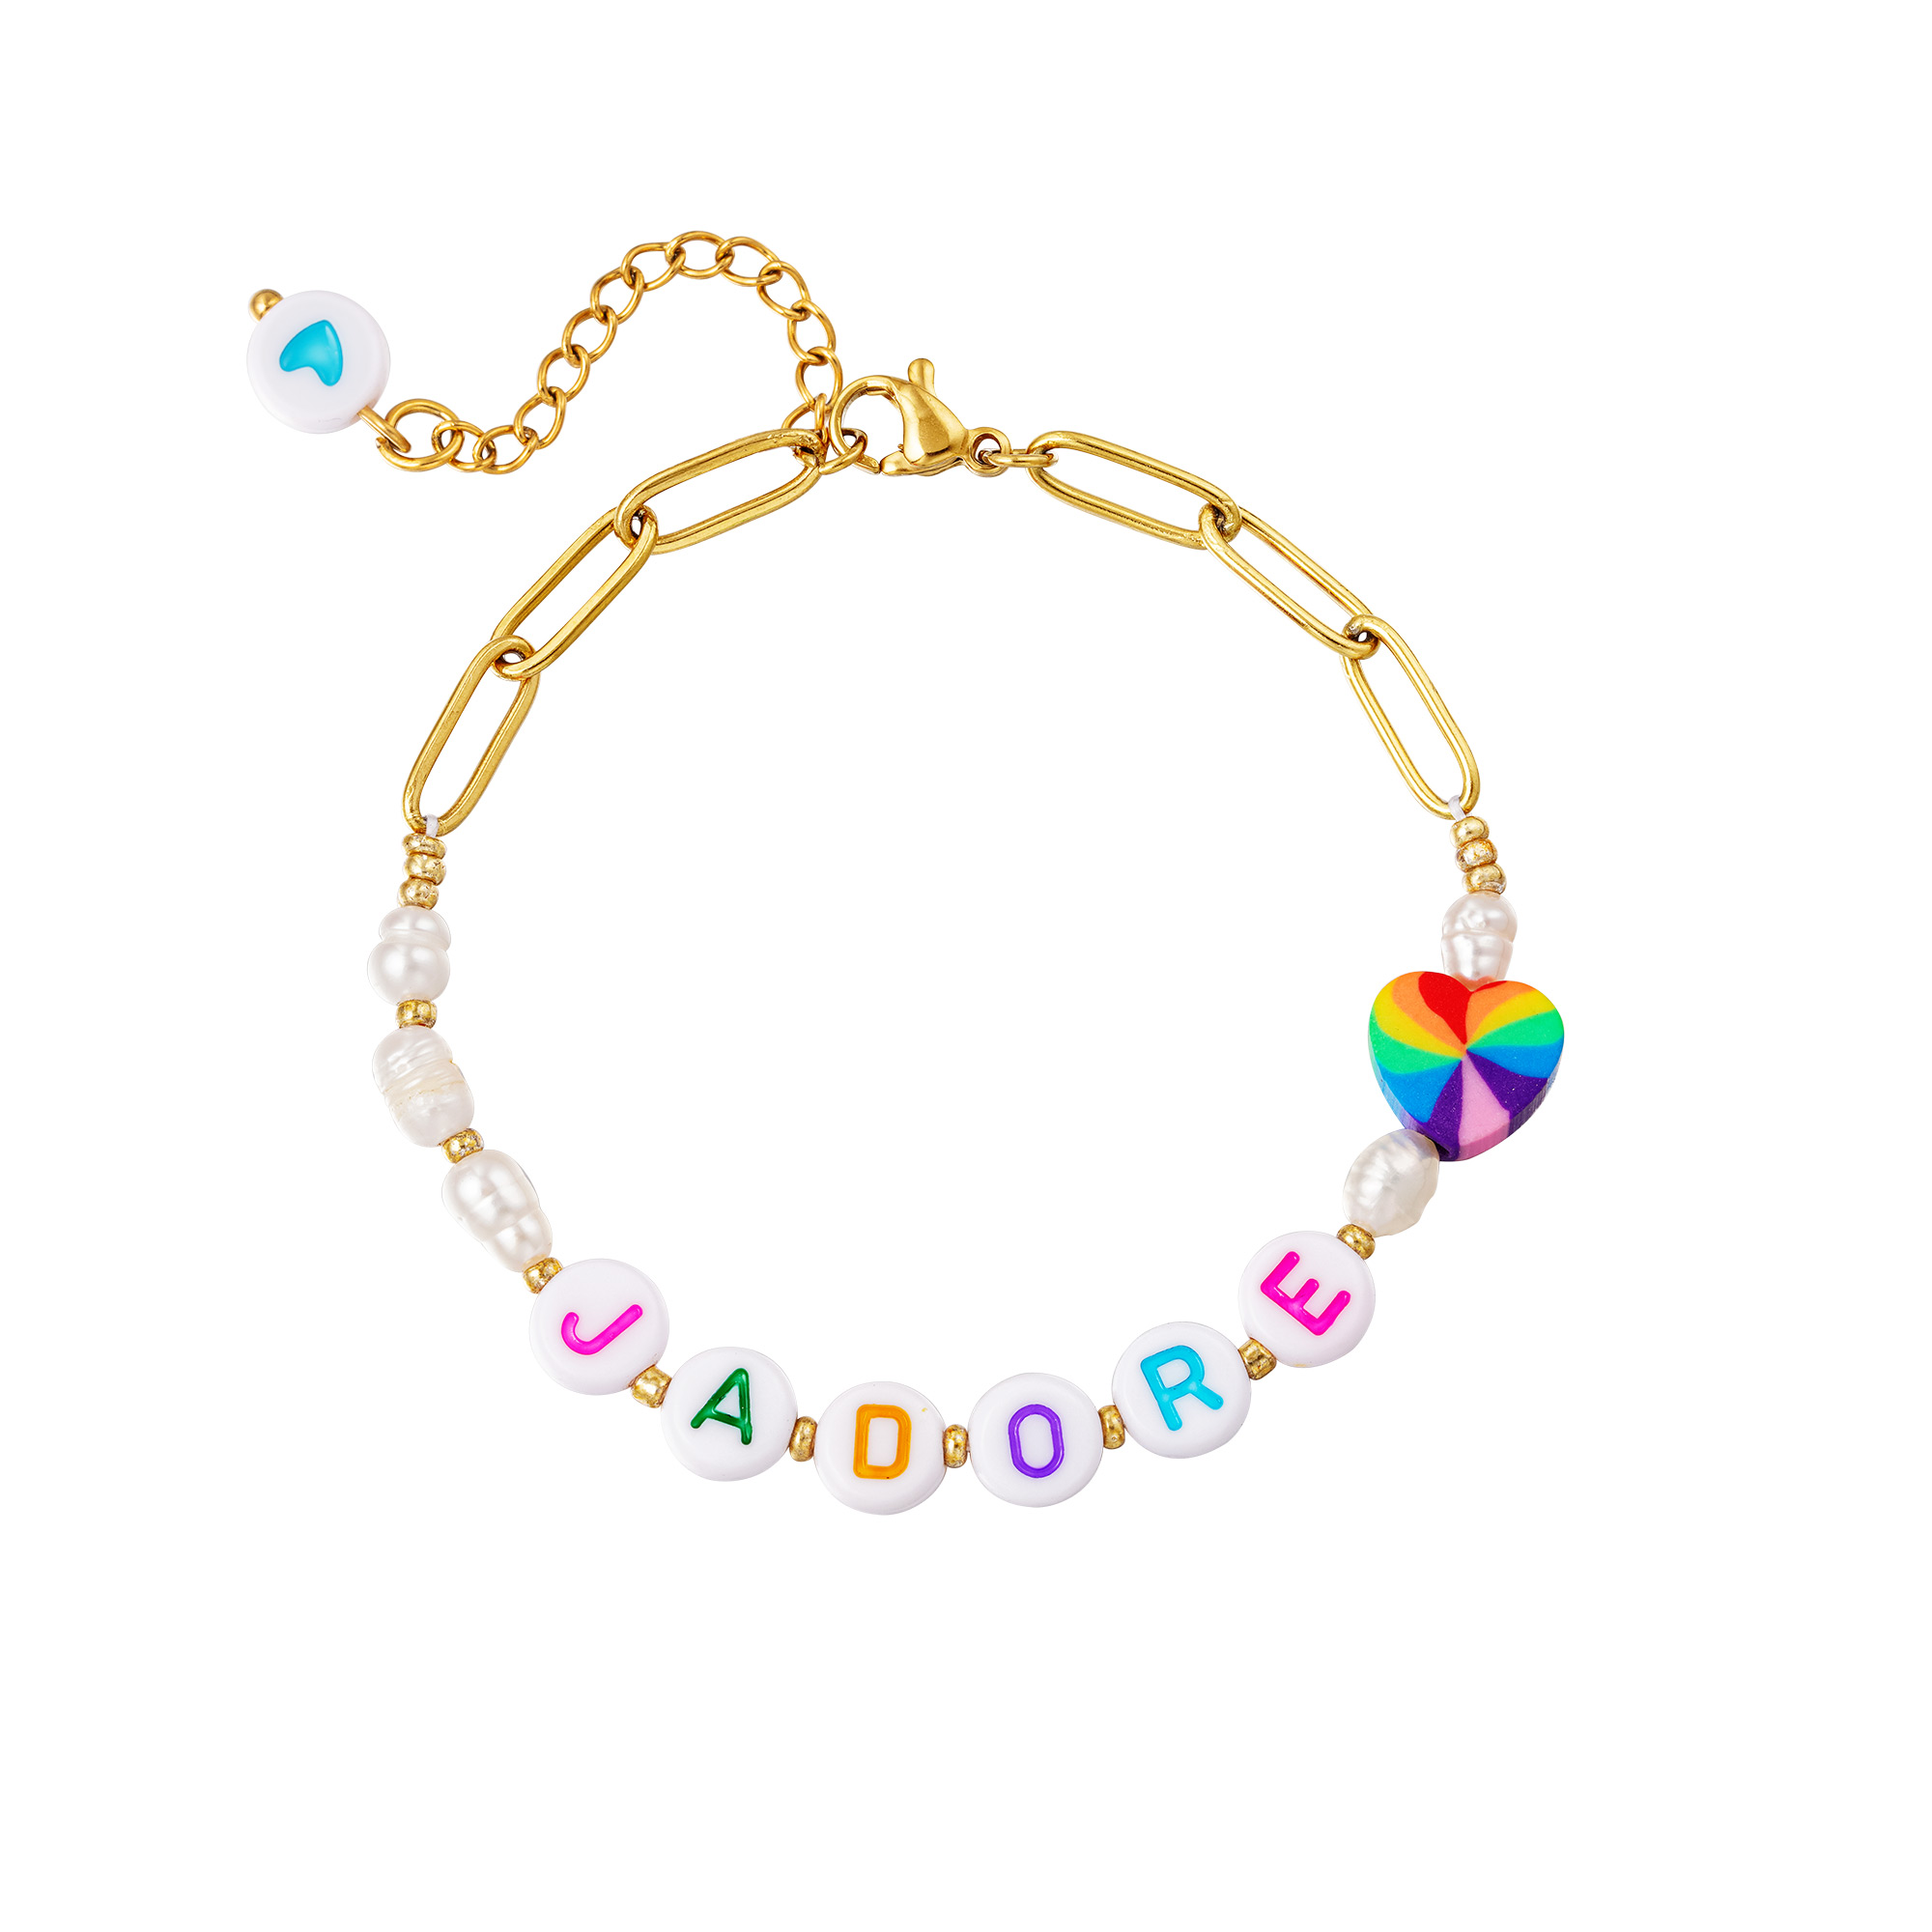 Stainless steel bracelet J'adore